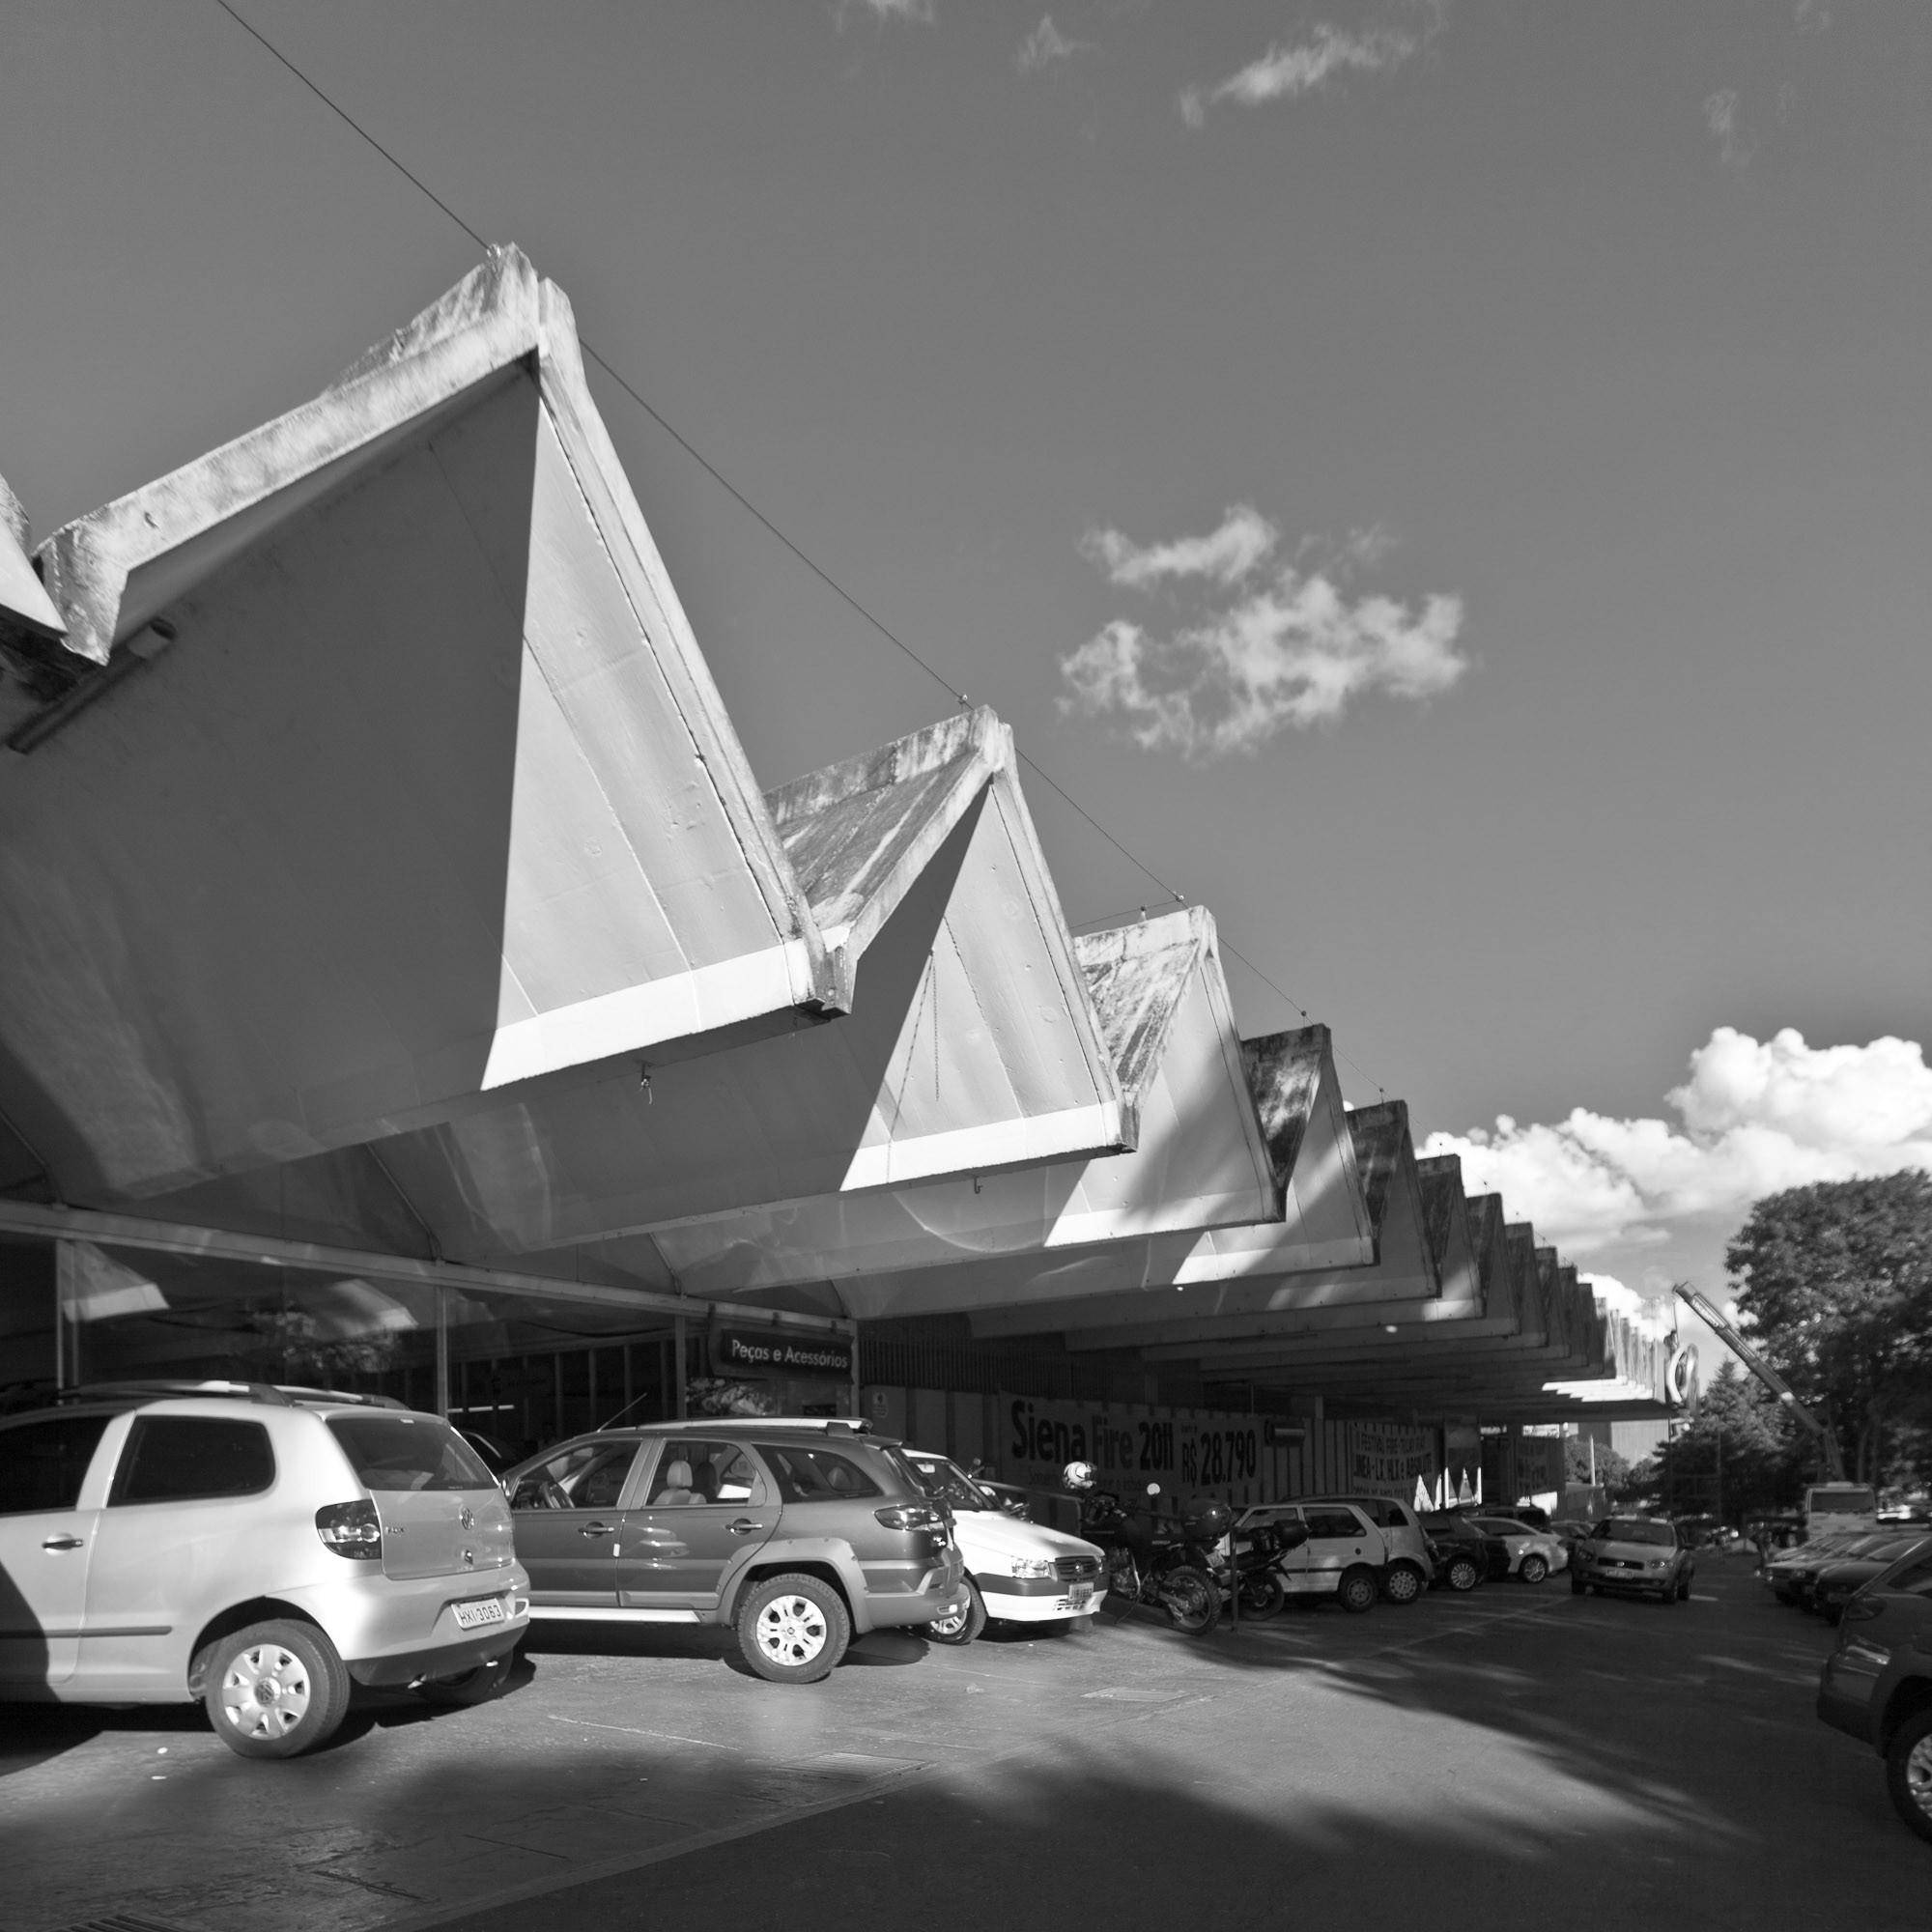 Concesionaria Planalto © Joana França